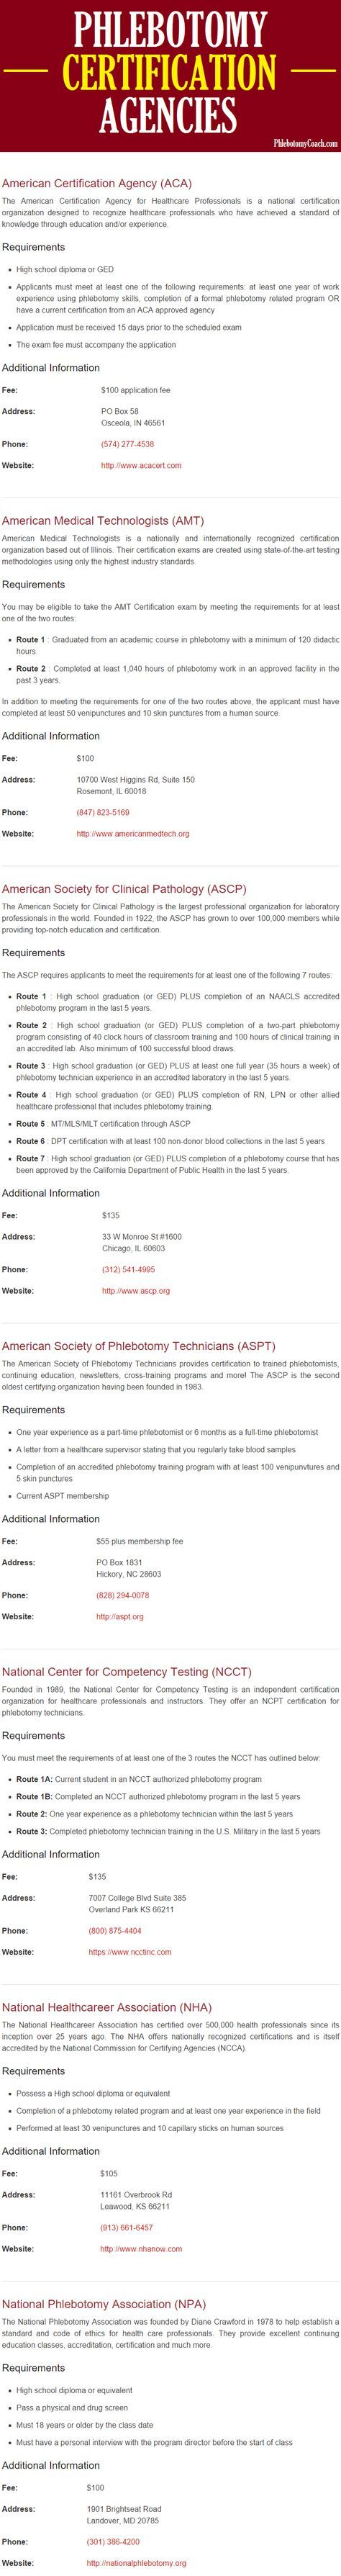 National phlebotomy certification programs that will jump start national phlebotomy certification programs that will jump start your career as a phlebotomist 1betcityfo Choice Image